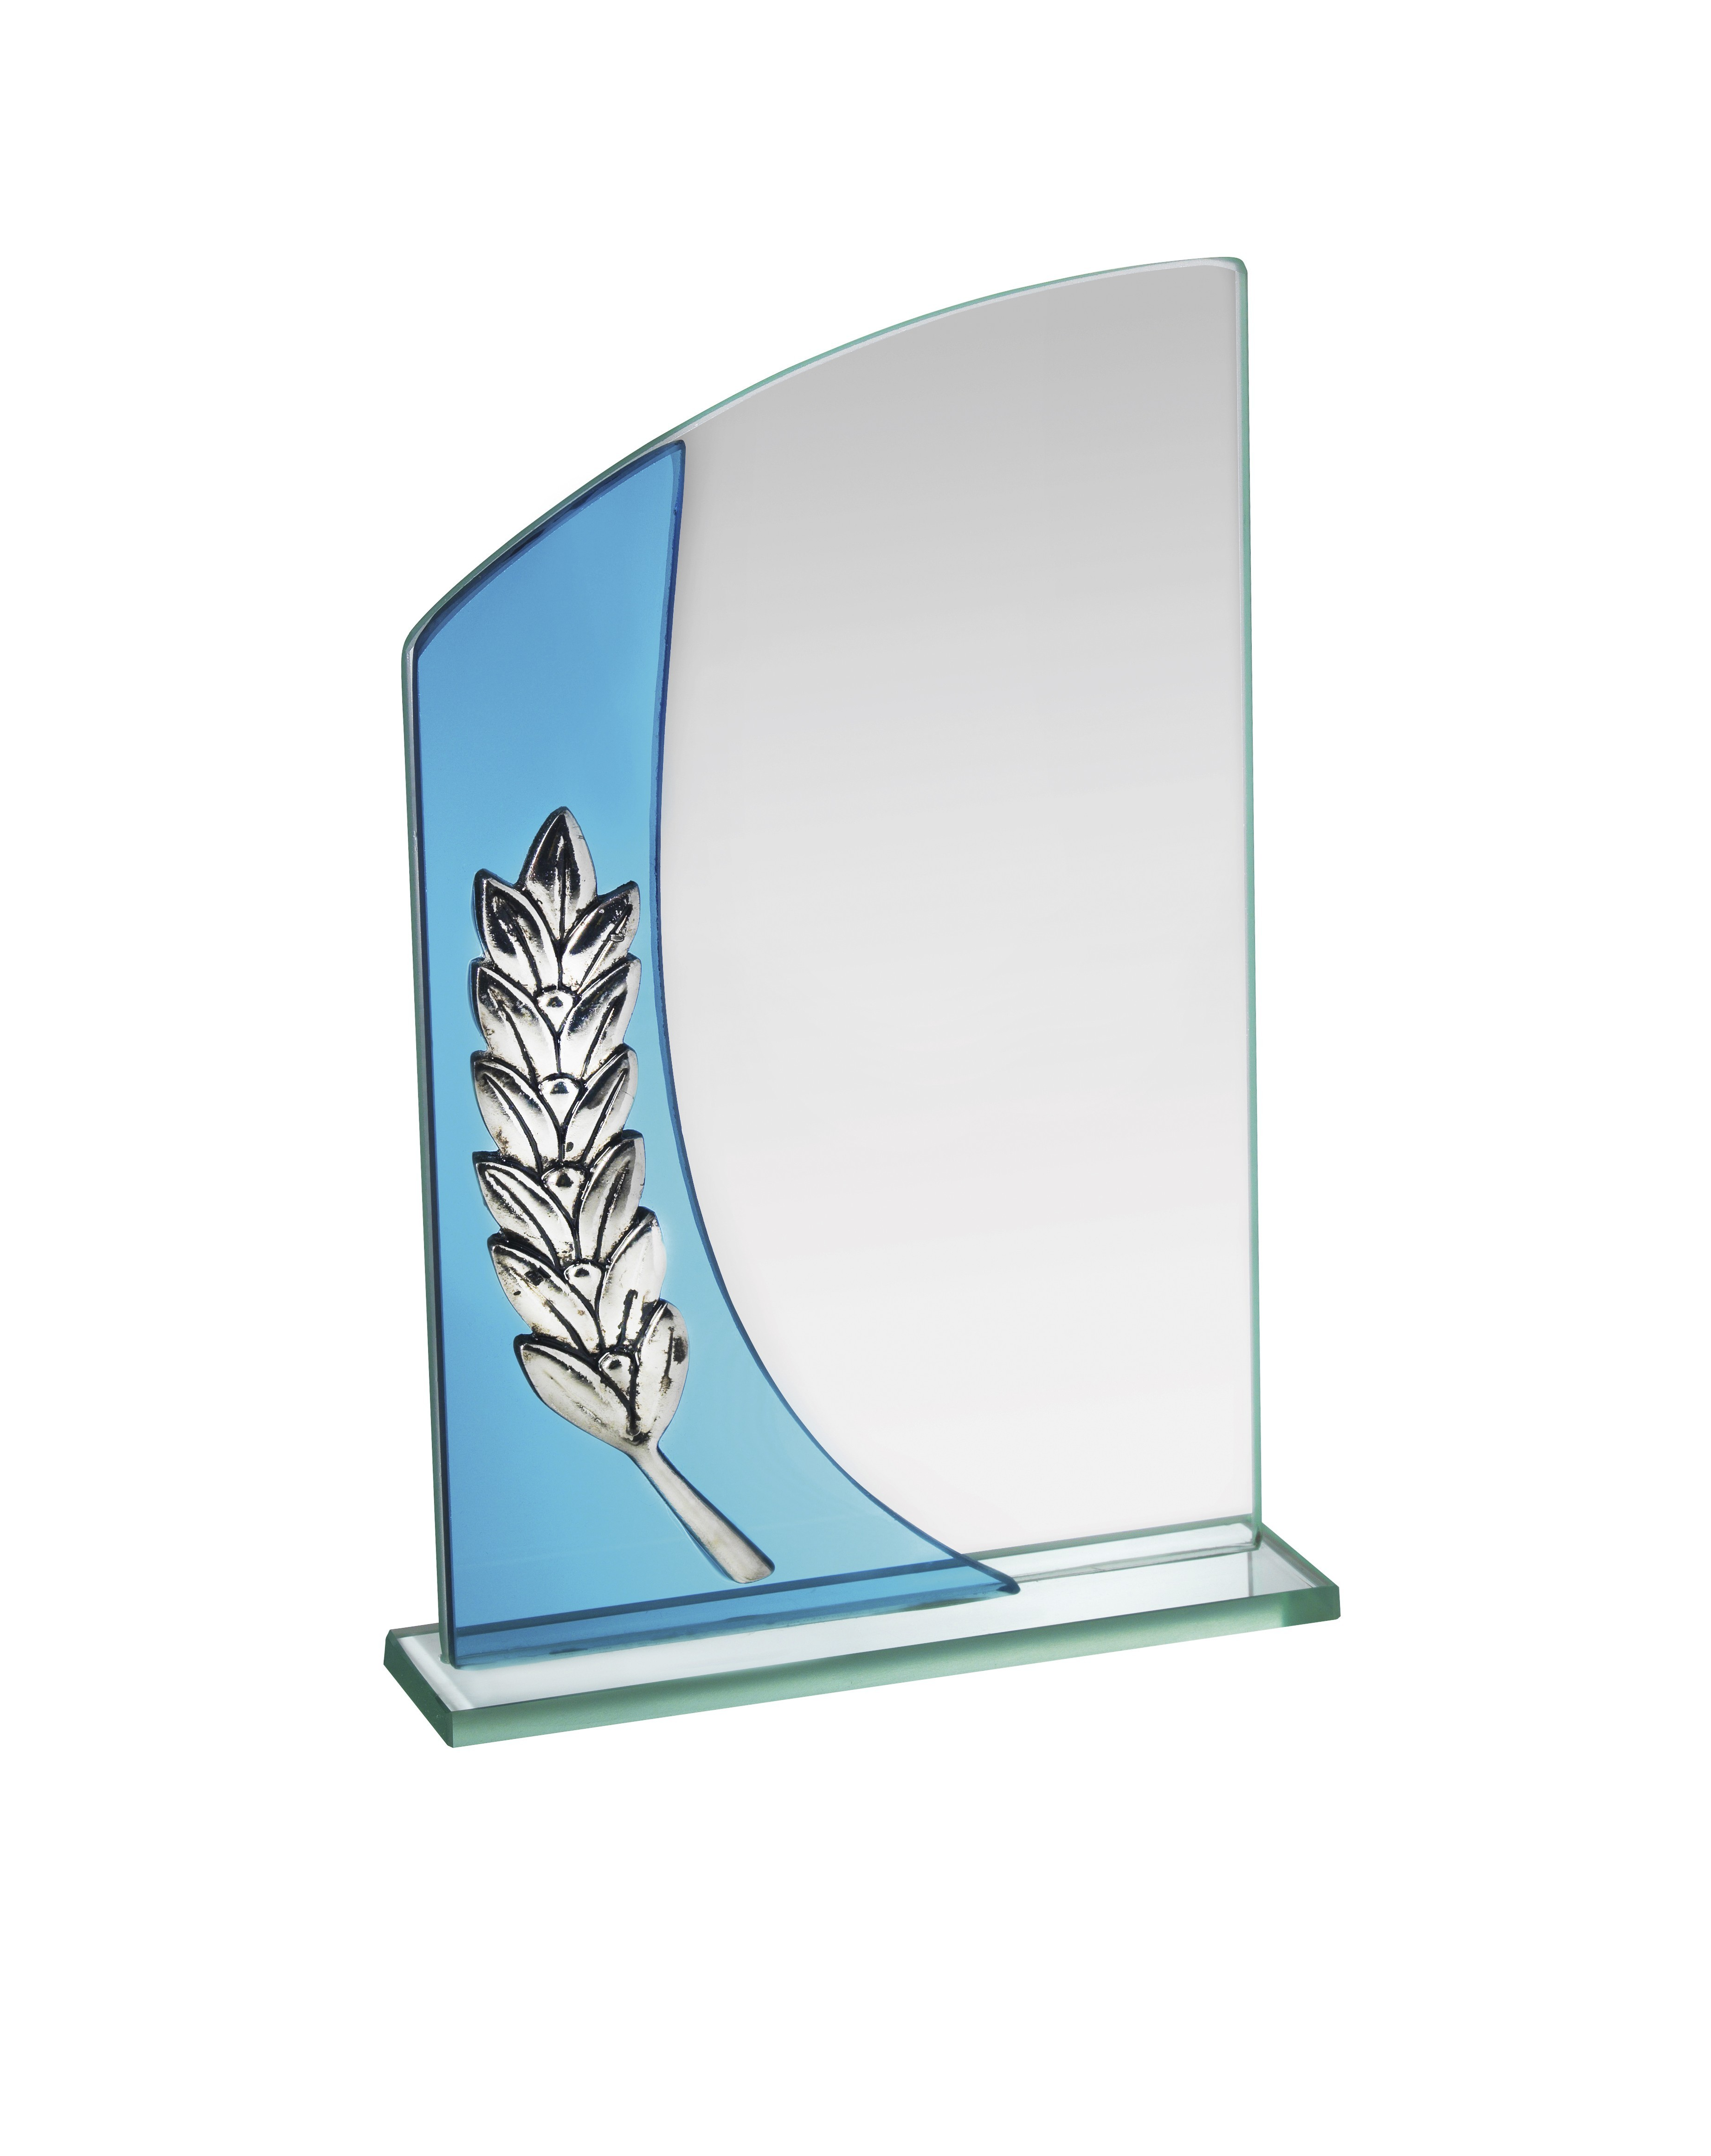 13.75cm Gls Award with Wreath in Box